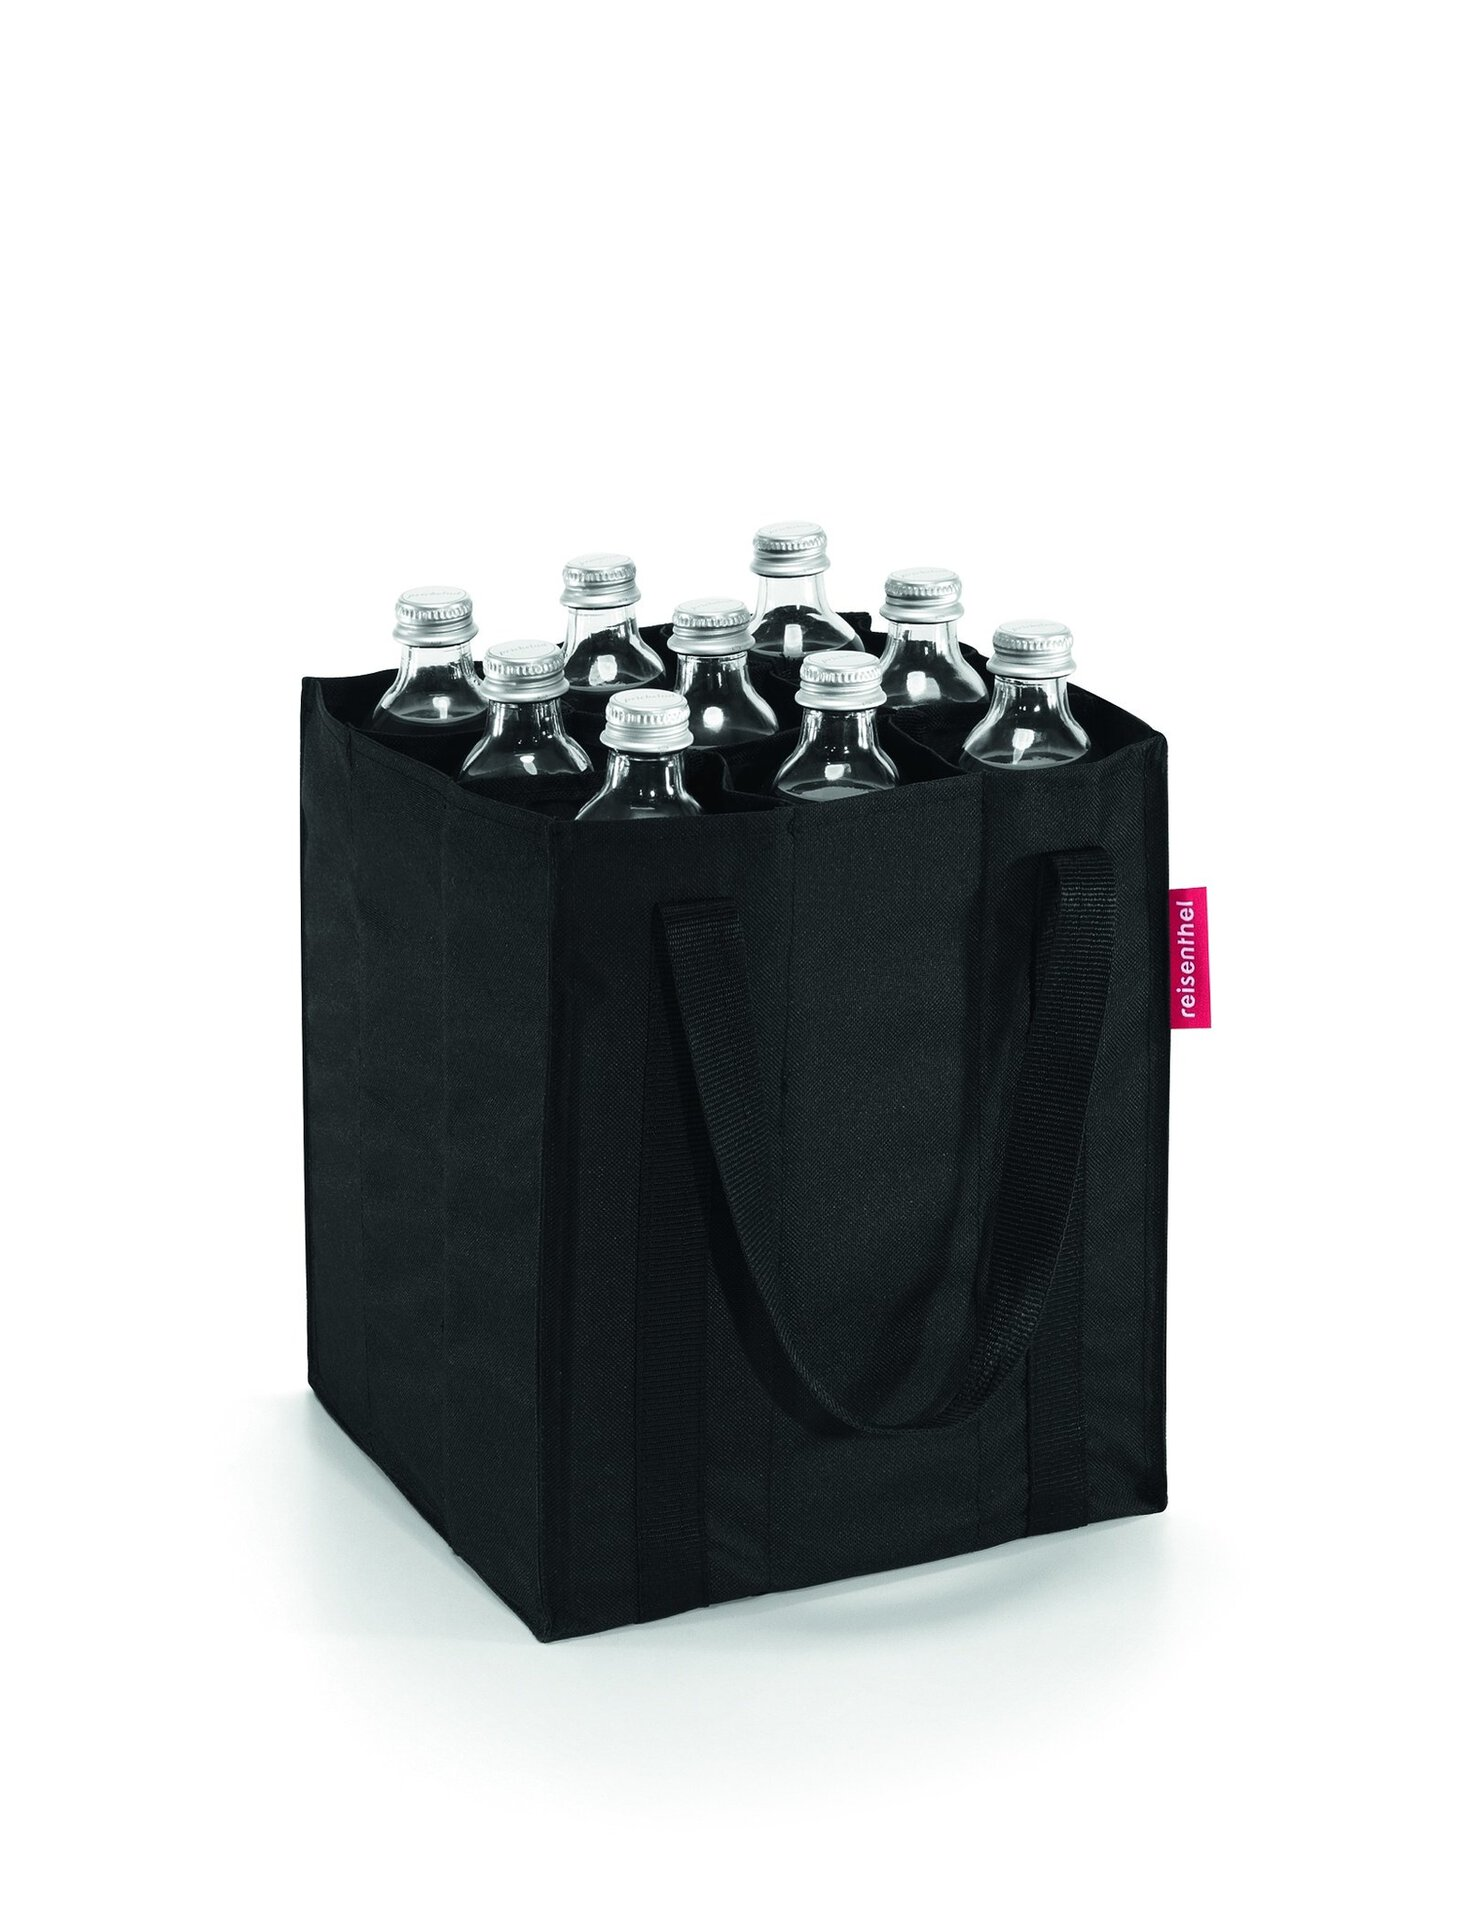 Tasche bottlebag Reisenthel Textil 24 x 28 x